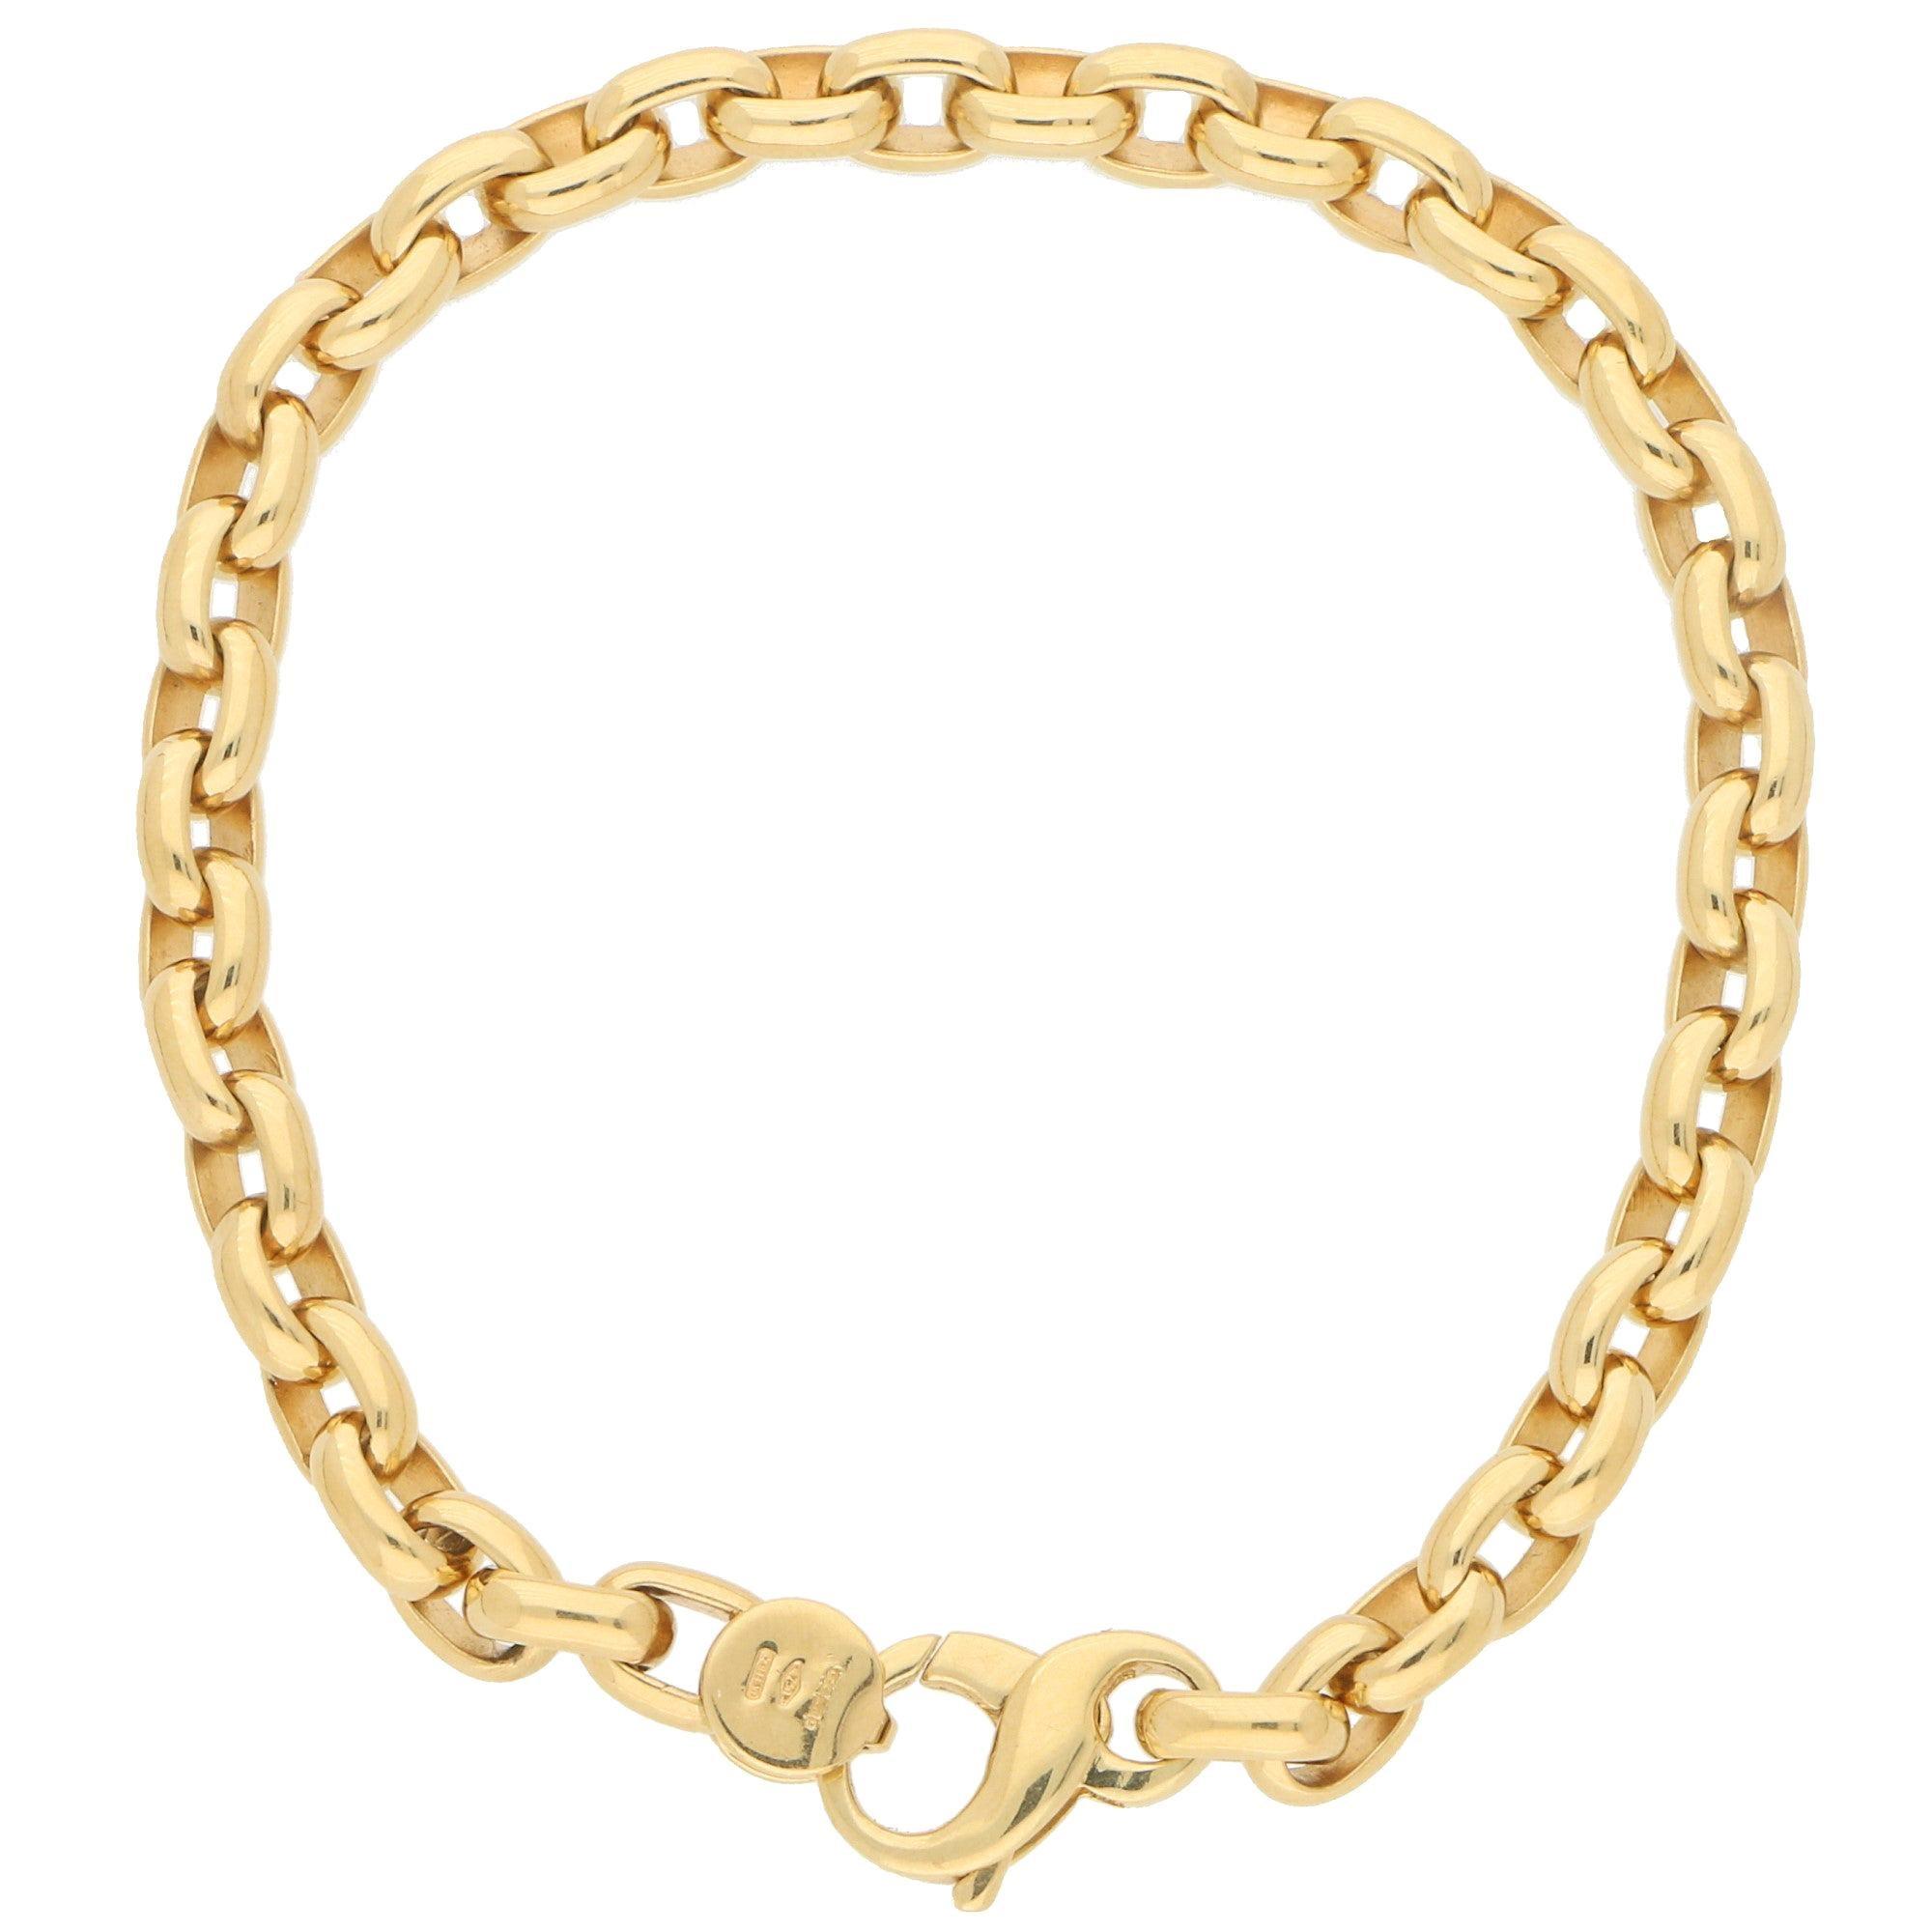 Chunky Chain Bracelet in 18 Karat Yellow Gold